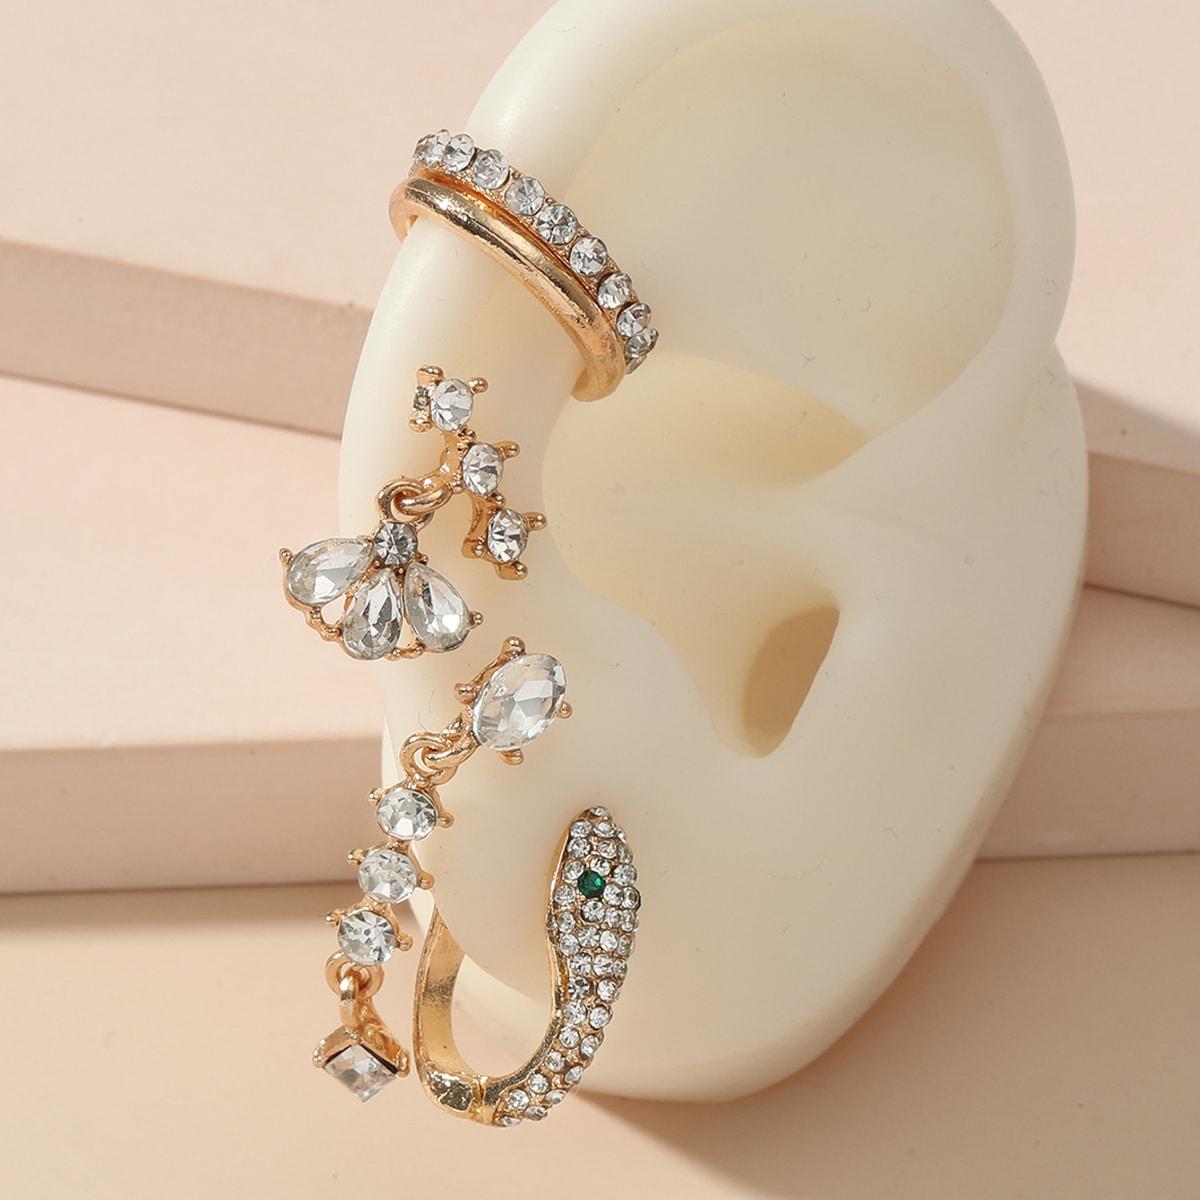 5pcs Rhinestone Serpentine Decor Earrings